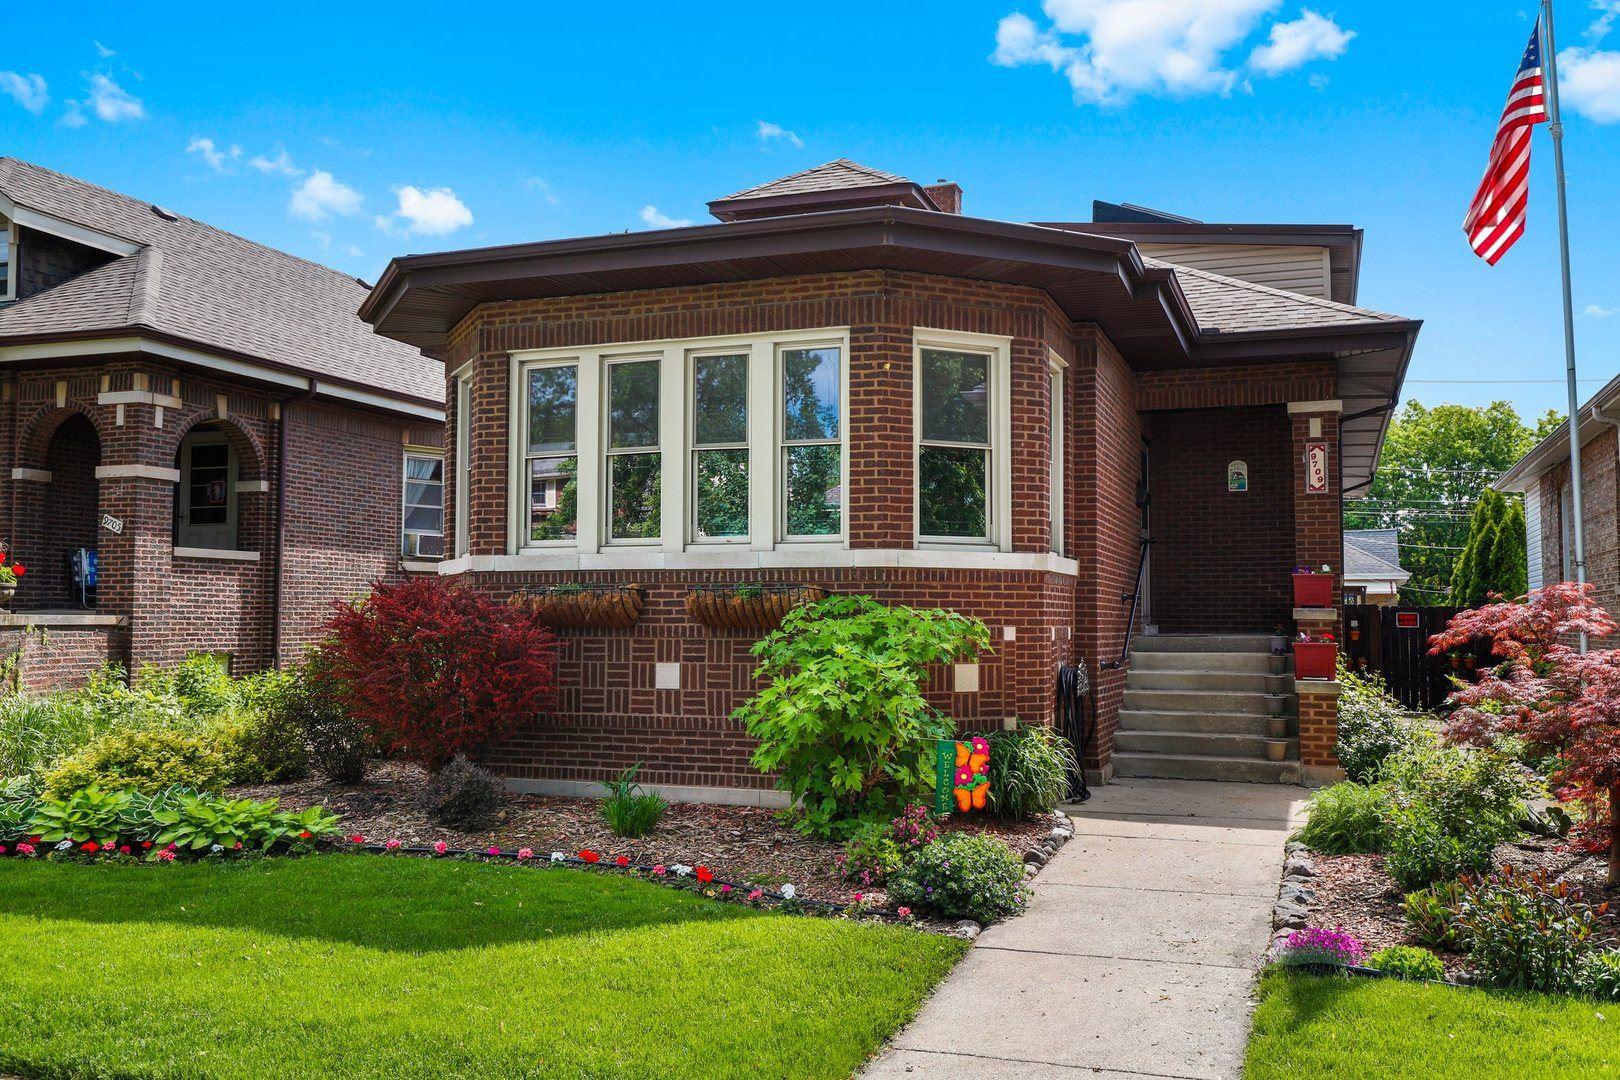 9709 S Hoyne Avenue, Chicago, IL 60643 - #: 10727954